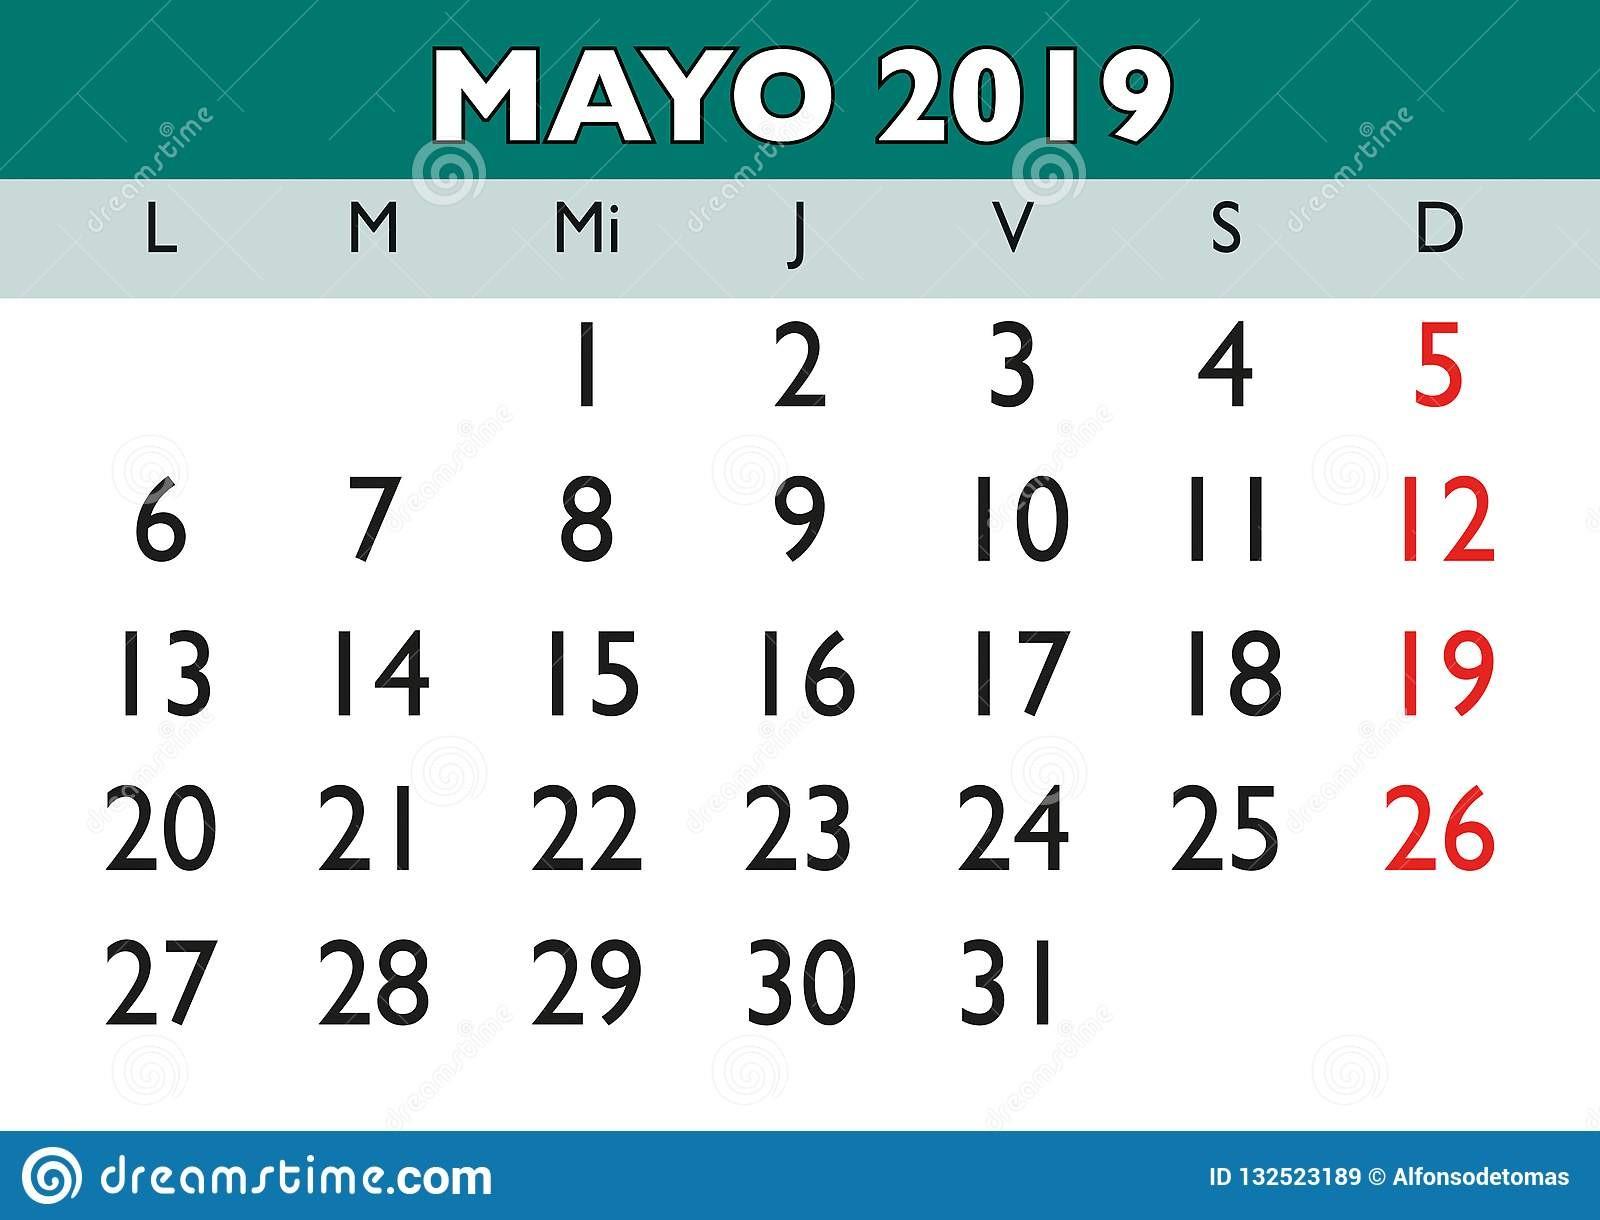 may wall calendar spanish month year mayo calendario